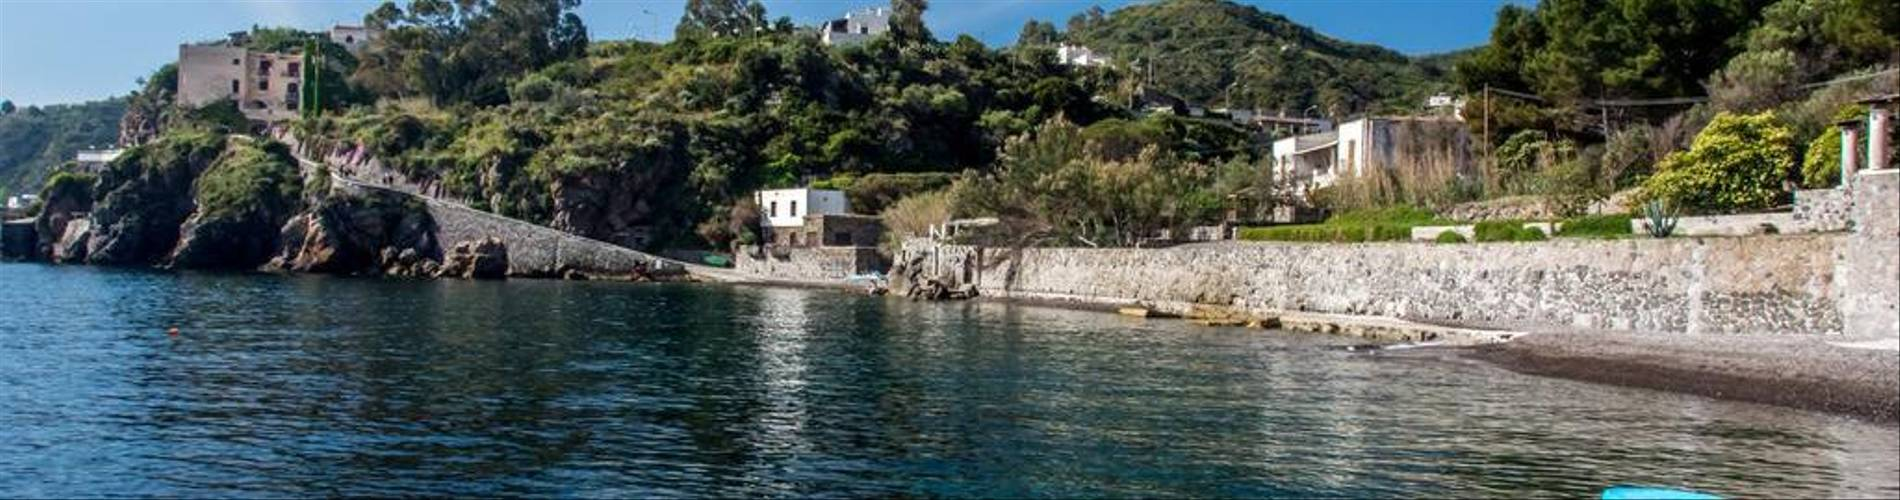 Rocce Azzurre, Sicily, Italy (4).jpg